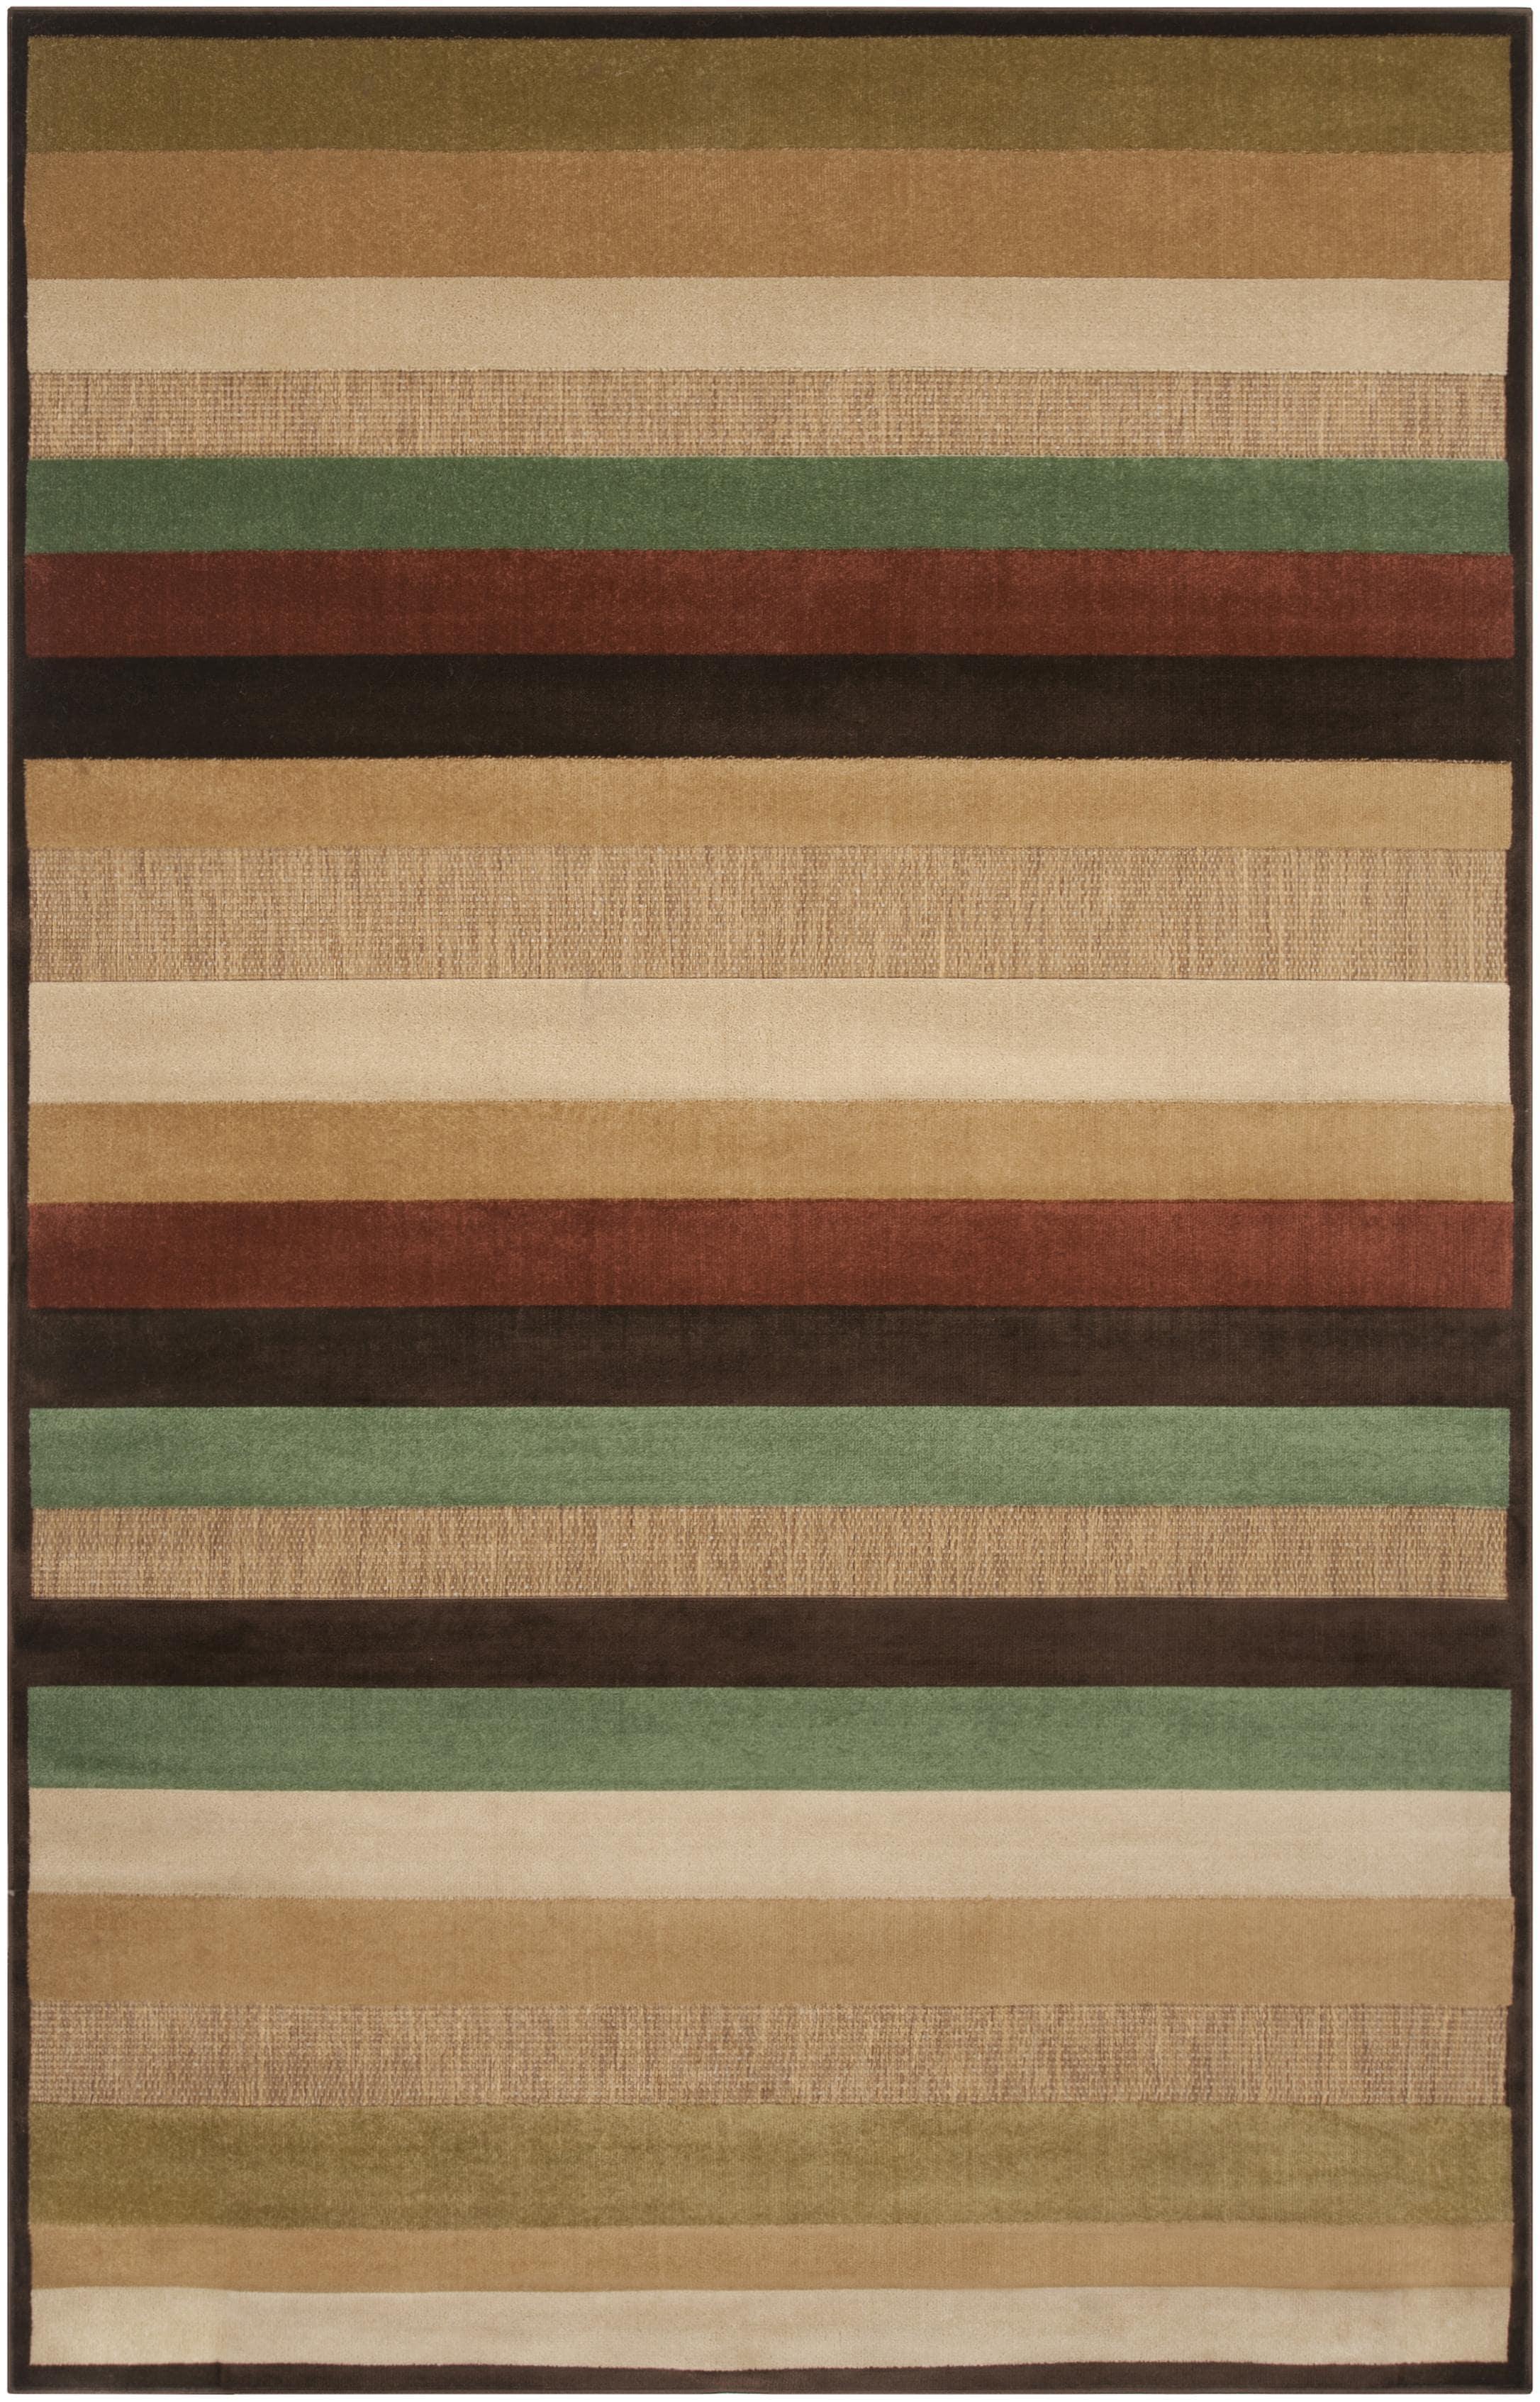 Warm Stripes Indoor/ Outdoor Area Rug - 7'10 x 10'8